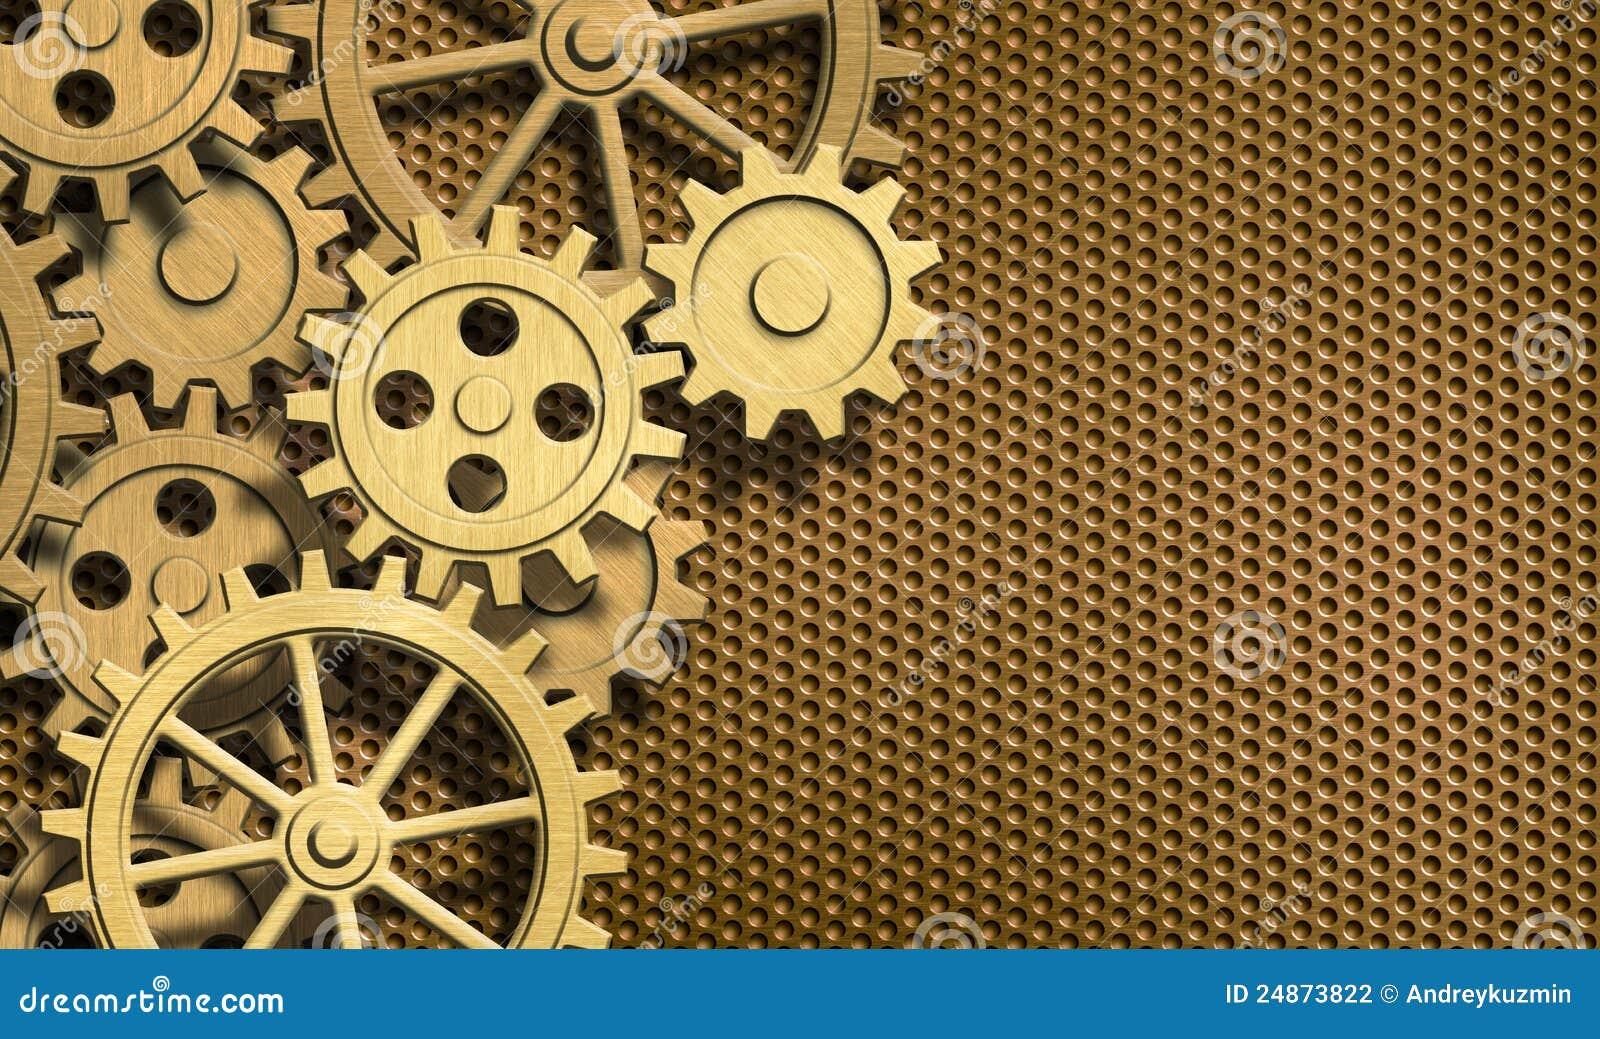 golden clockwork gears metal background stock illustration